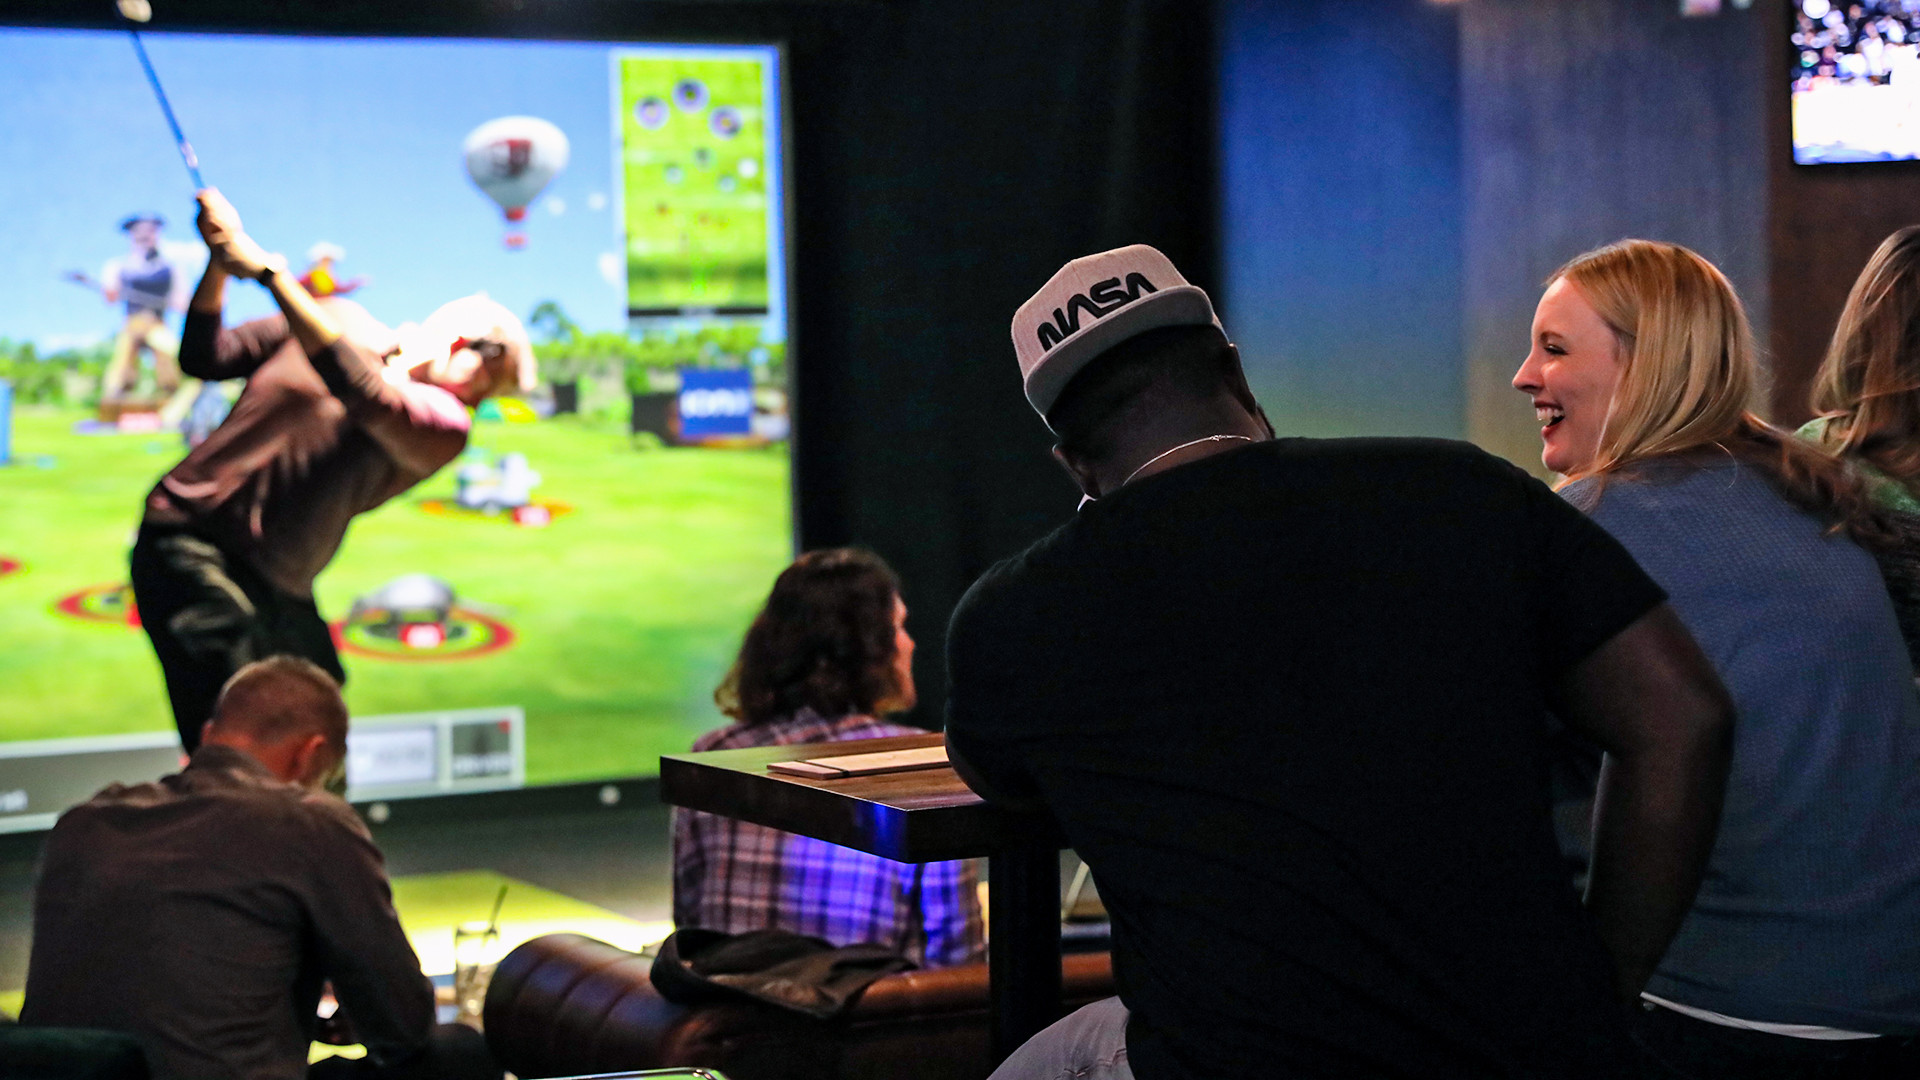 Loft18 Houston Simulators